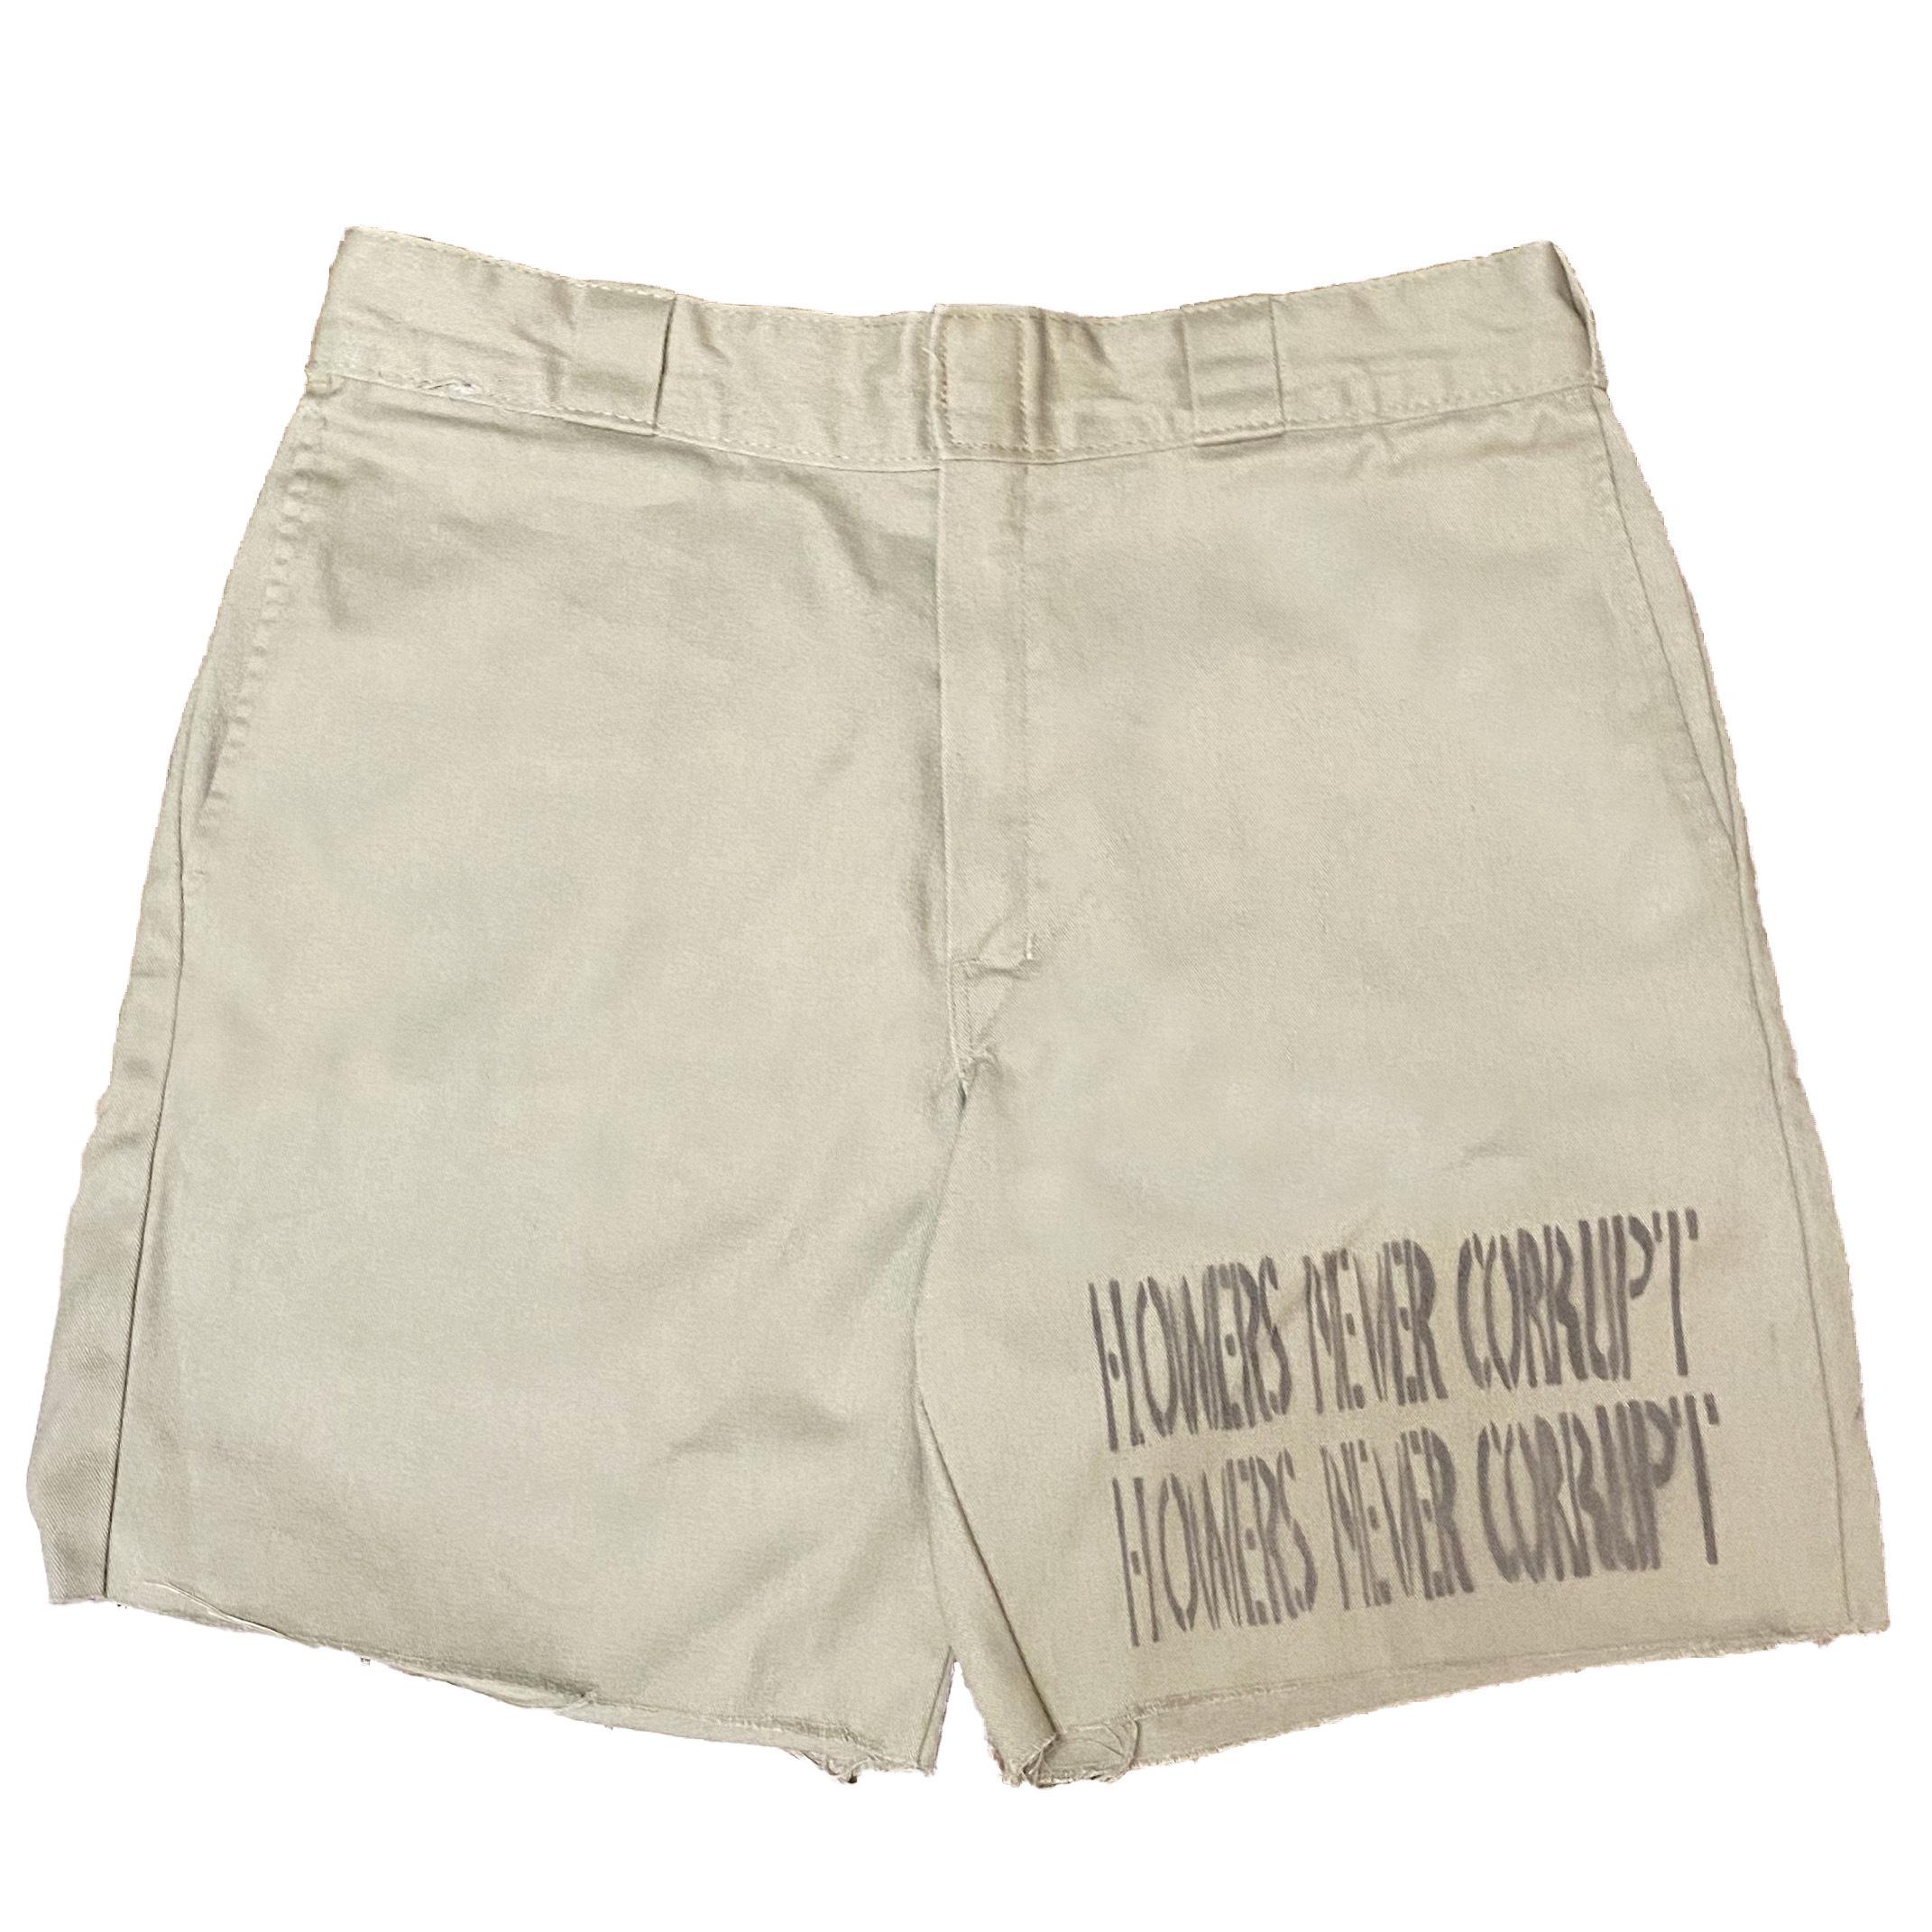 Flowers Never Corrupt Shorts - 画像1